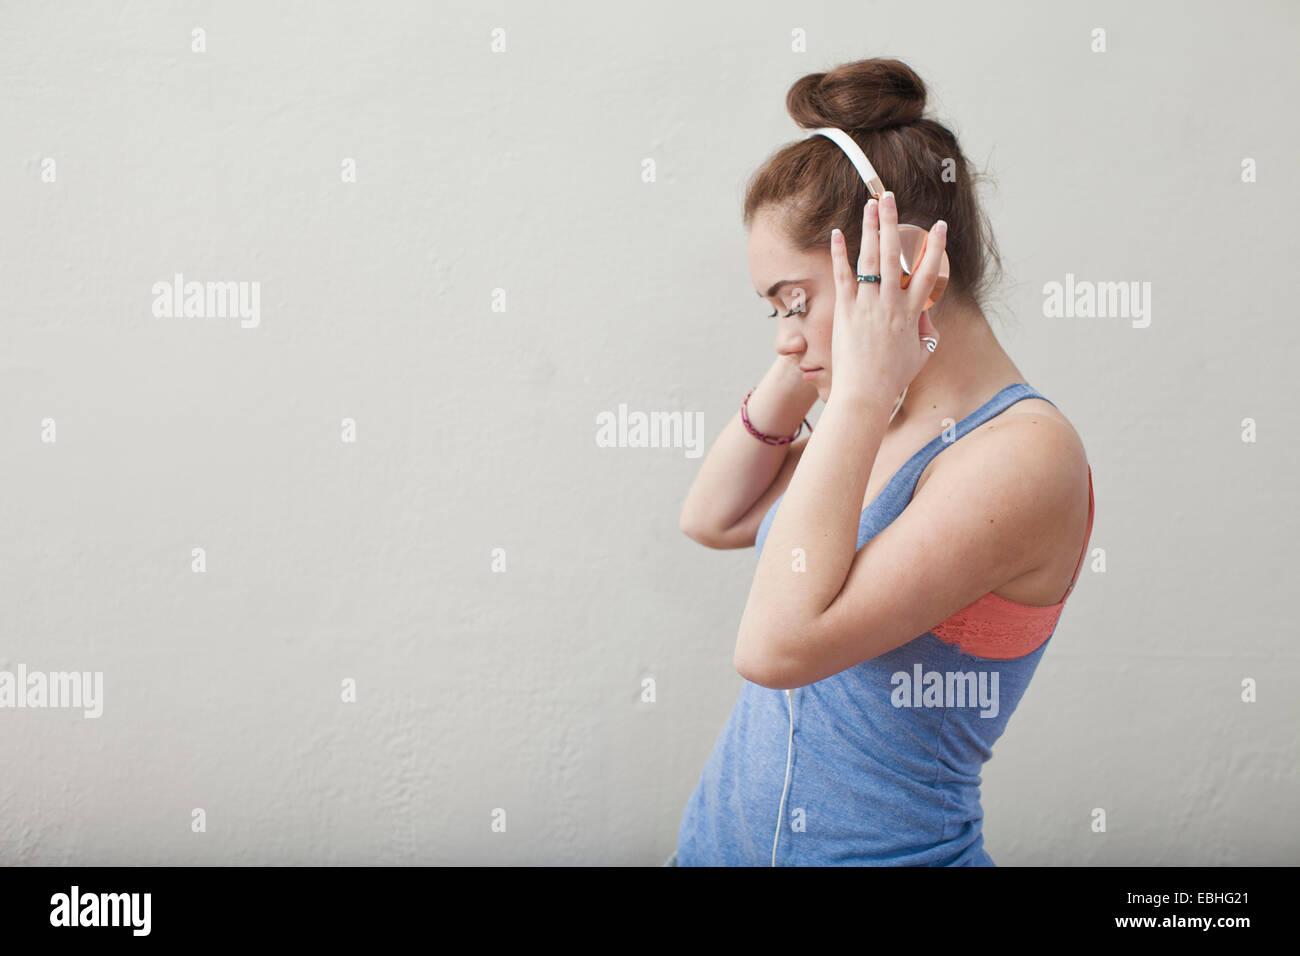 Teenage girl listening to music on headphones in ballet school - Stock Image